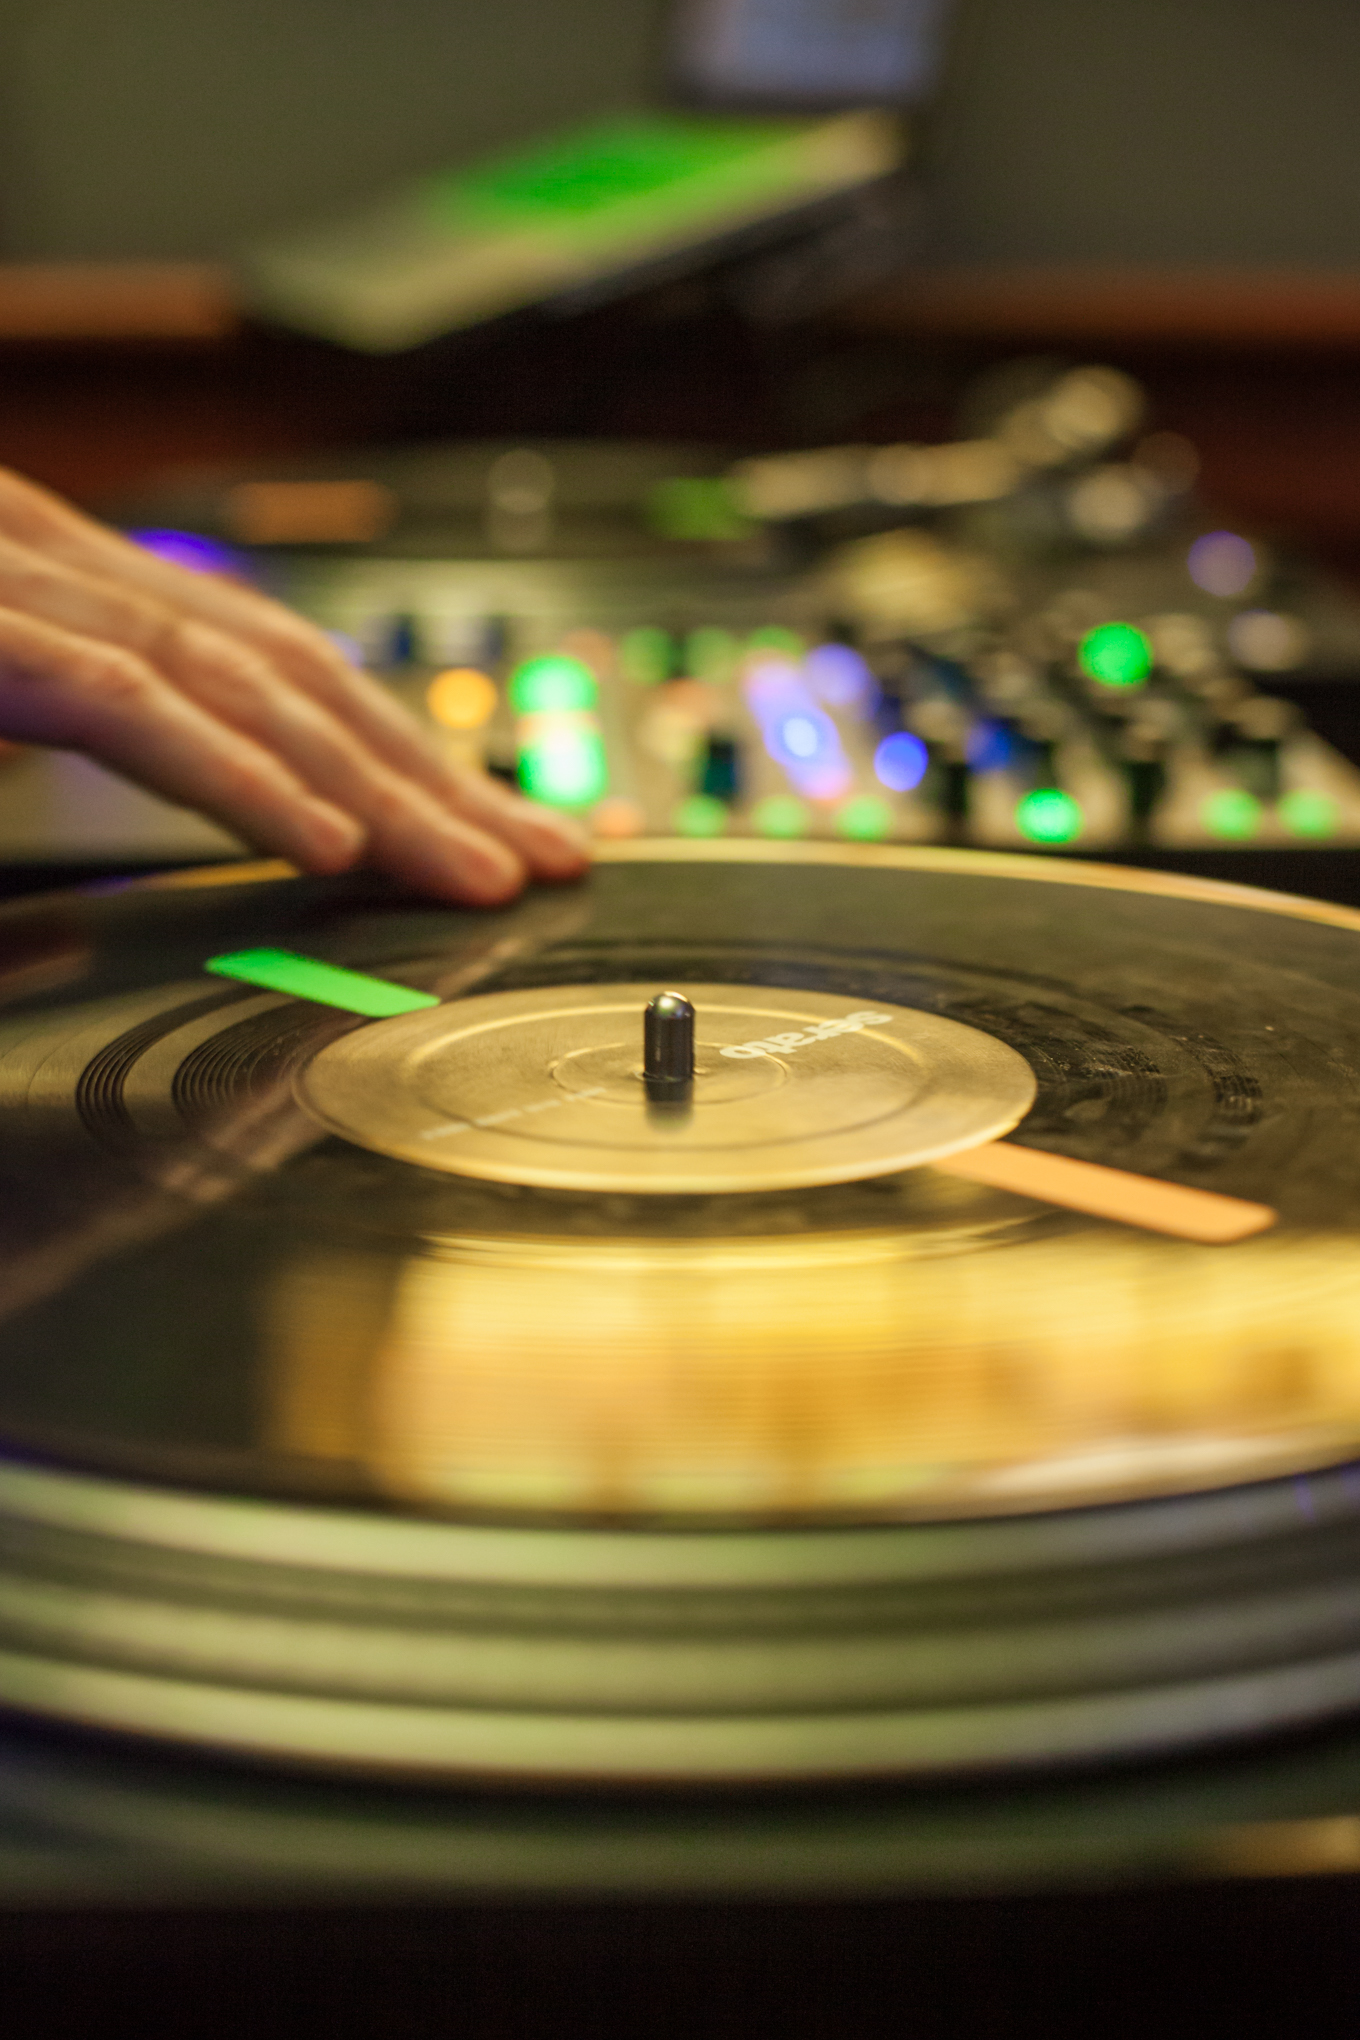 DJ+SKYHOOK-8.jpg